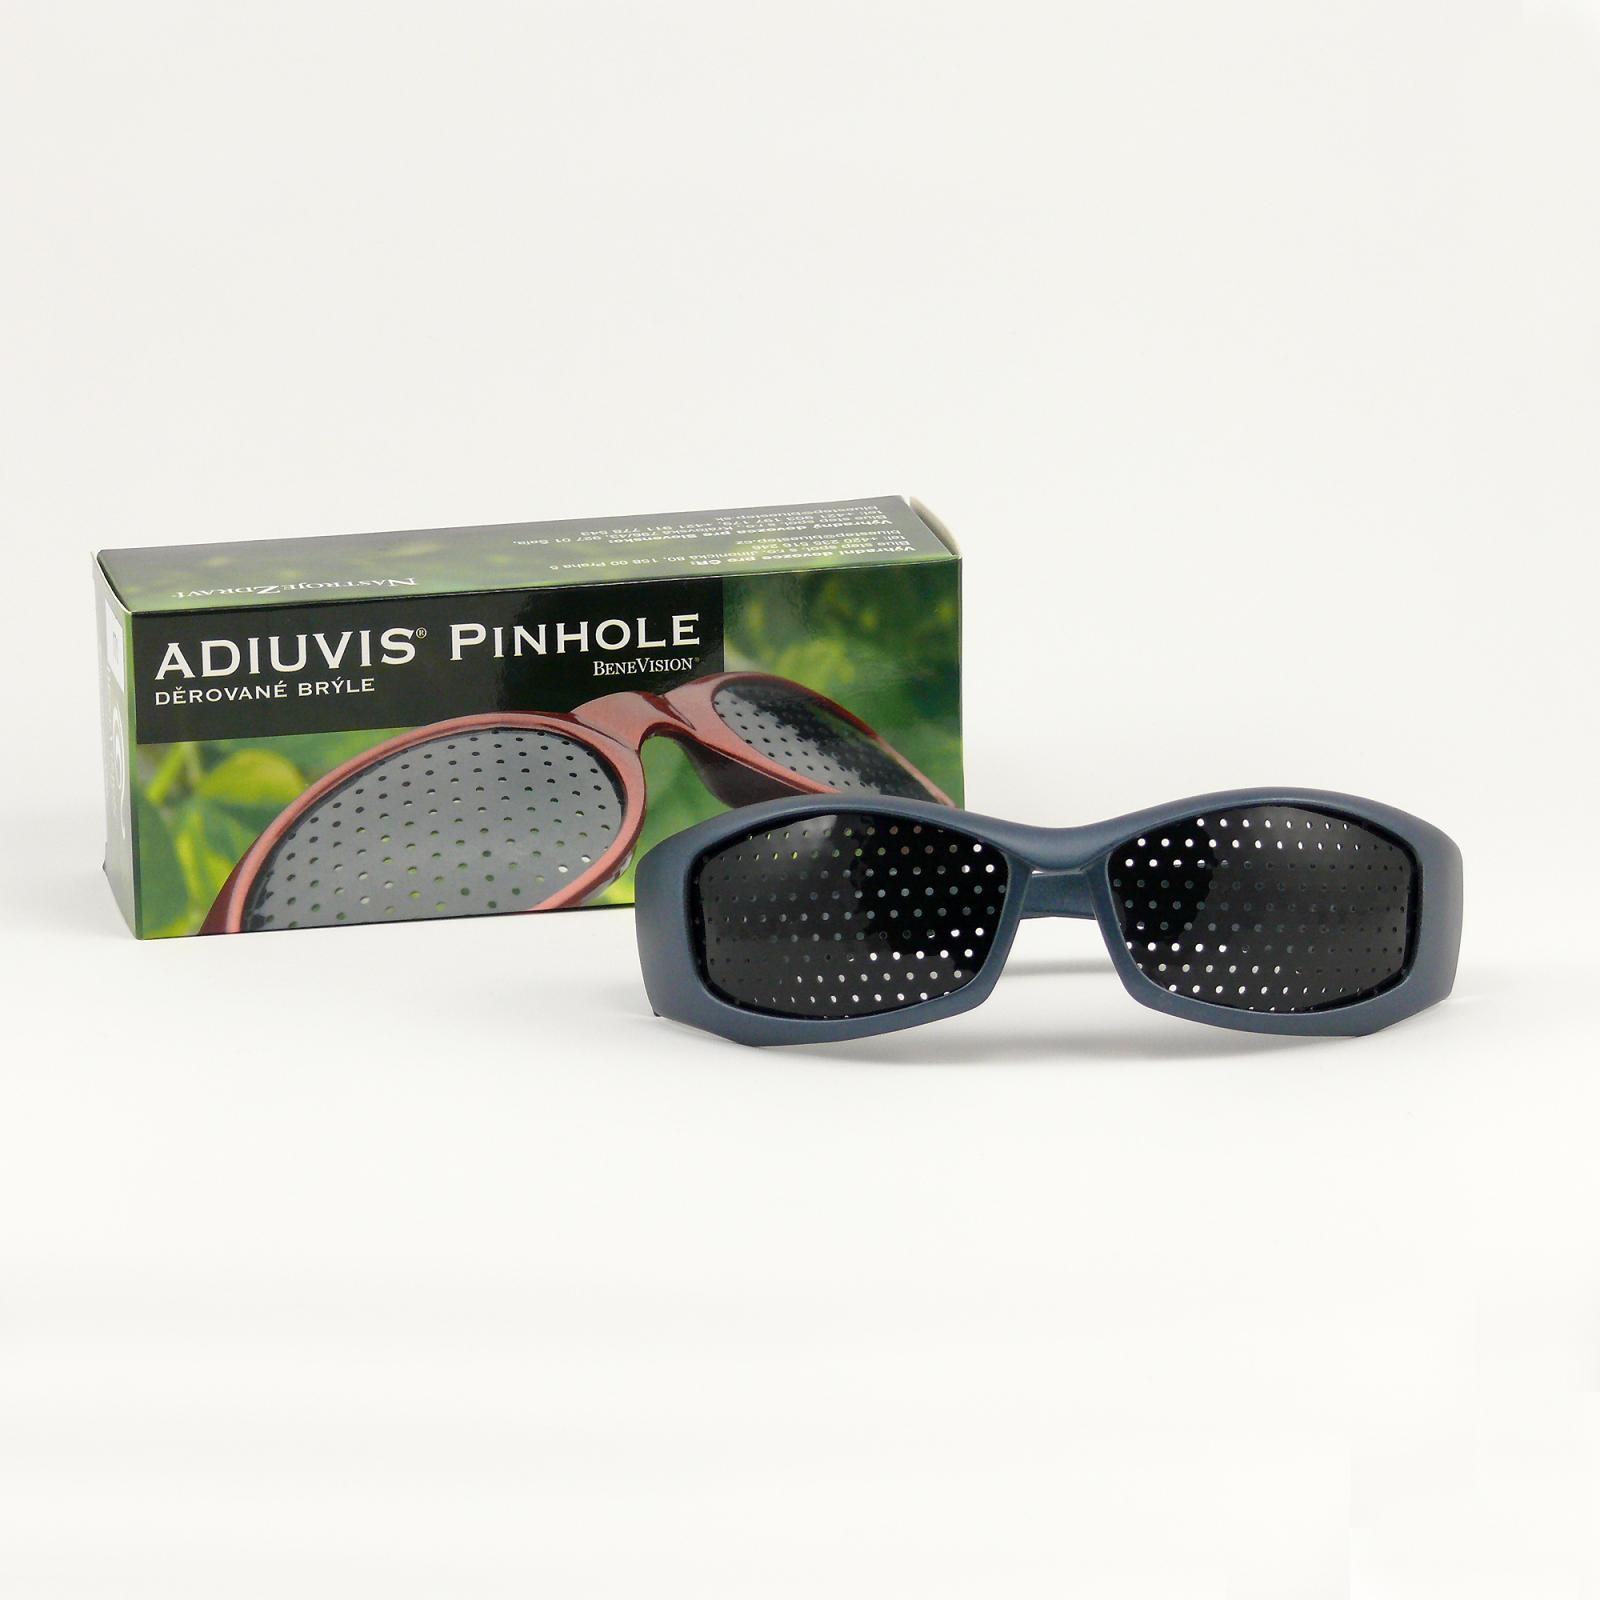 Bene Vision Děrované brýle ADIUVIS Pinhole CVH MB 1 ks